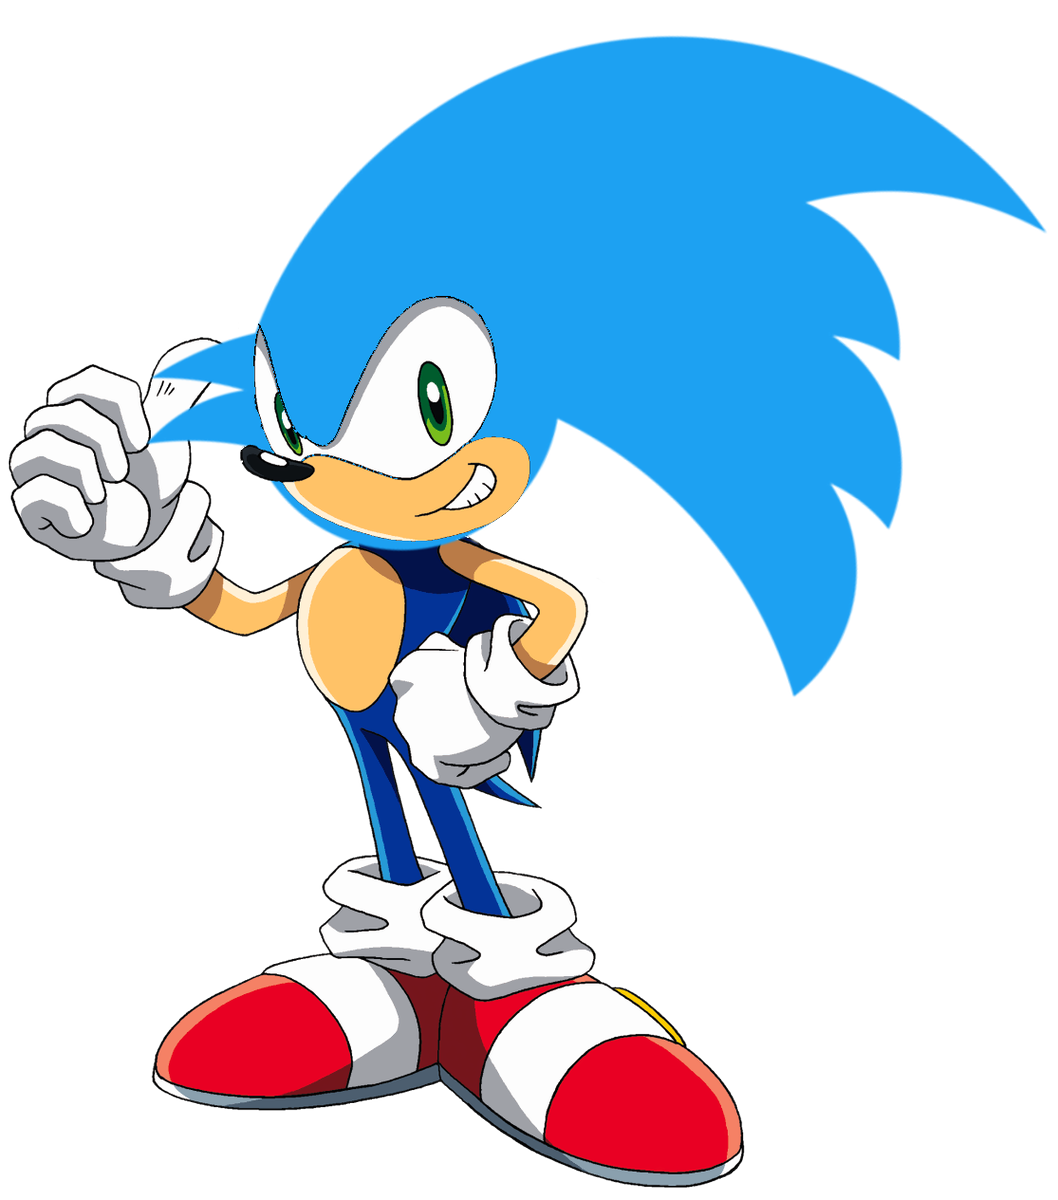 𝔜𝔥𝔰𝔞𝔫𝔞𝔳𝔢 On Twitter I Made Twitter S Sonicoc Twitic The Hedgehog Backstory The Twitter Logo Looks Like Sonic S Head Upside Down